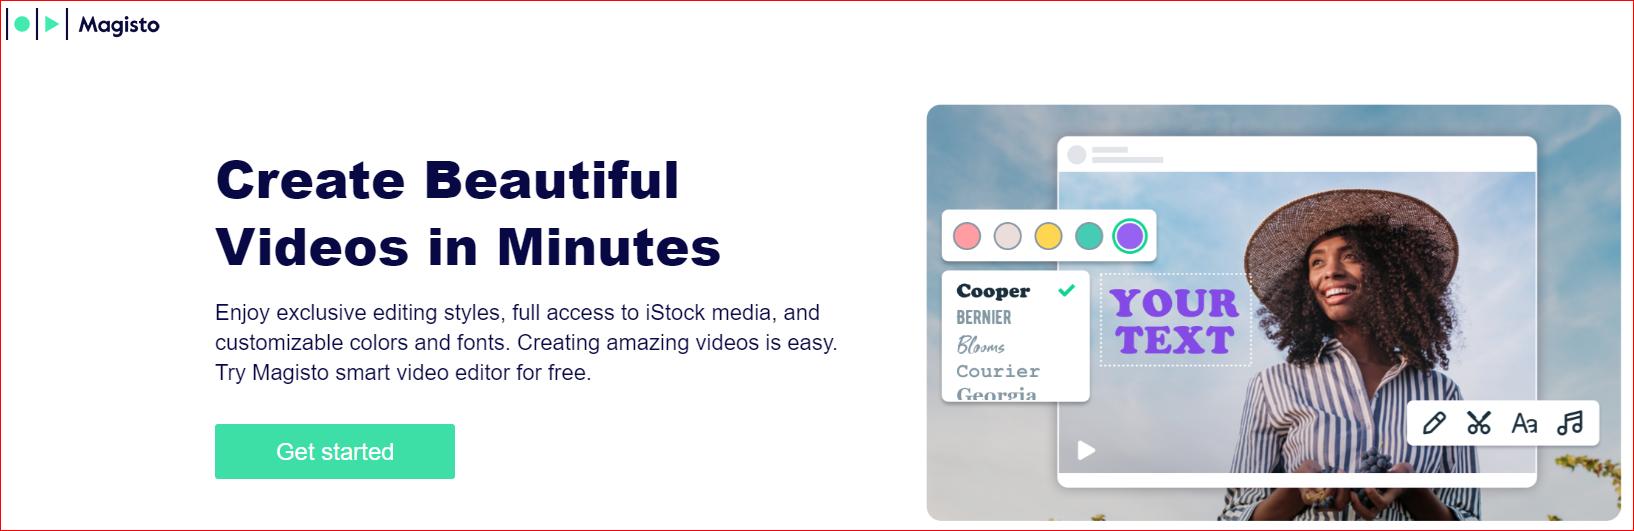 Magisto AI powered video editor